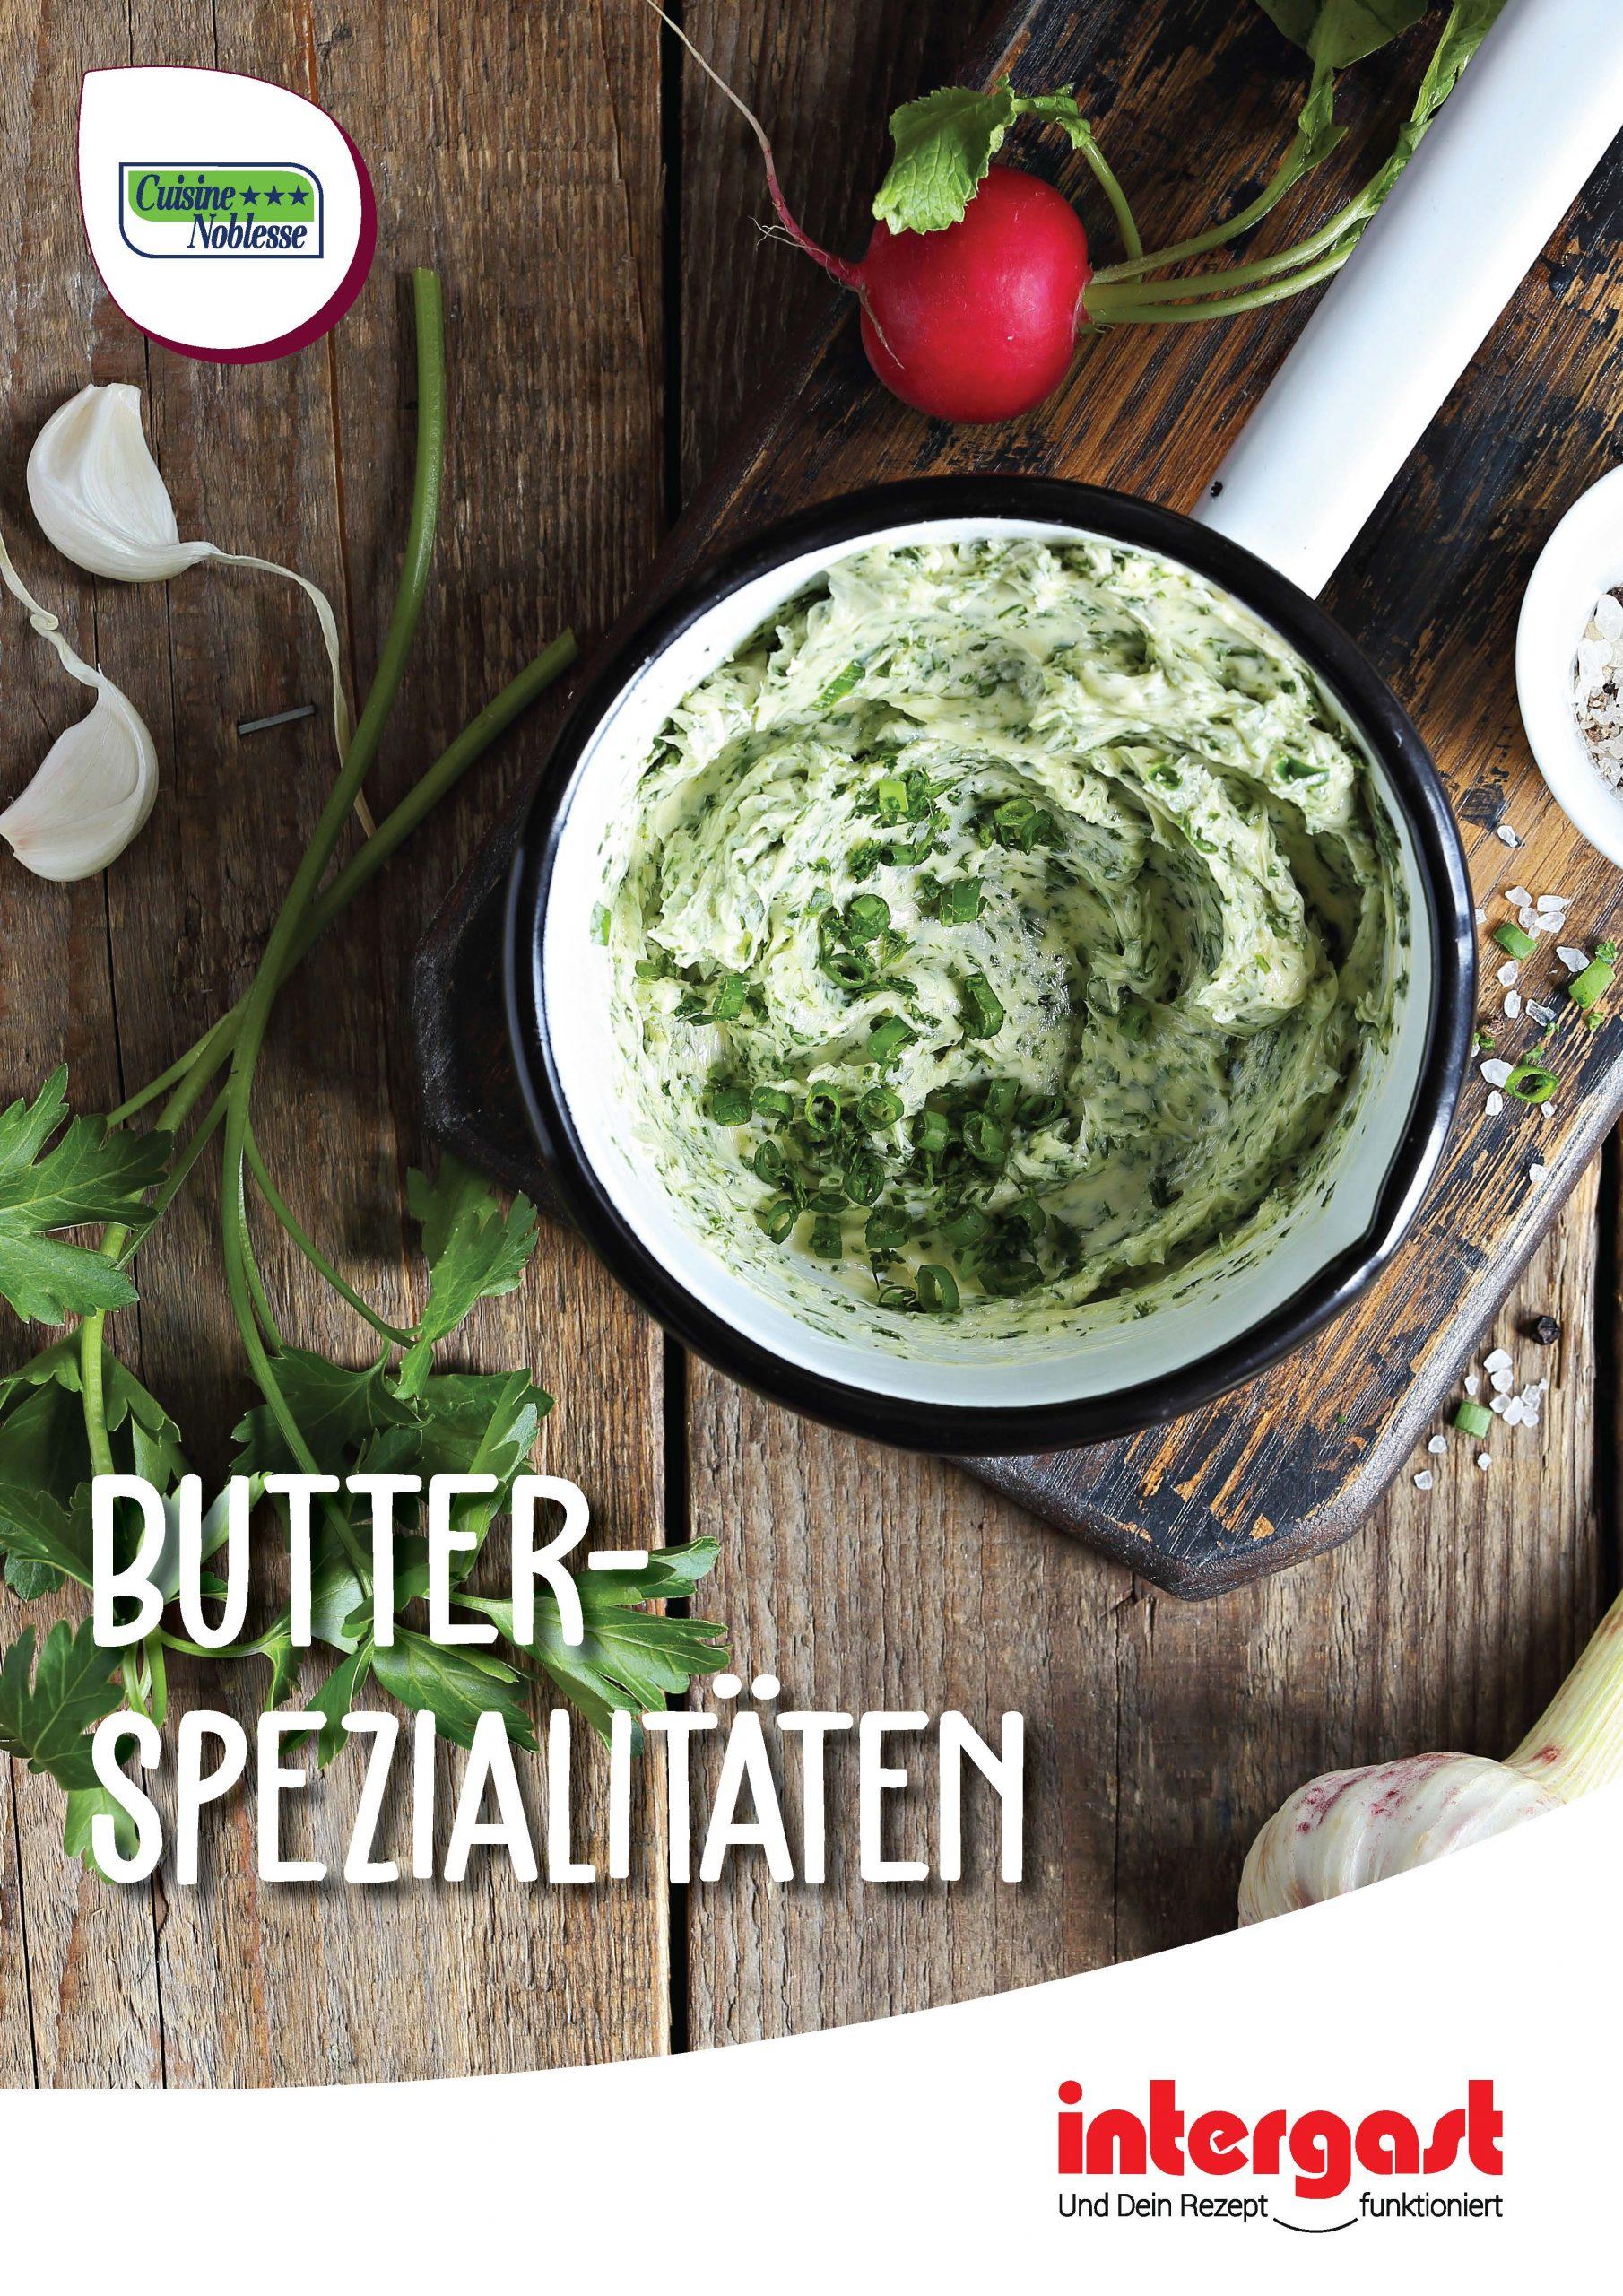 Cuisine Noblesse Butterspezialitäten